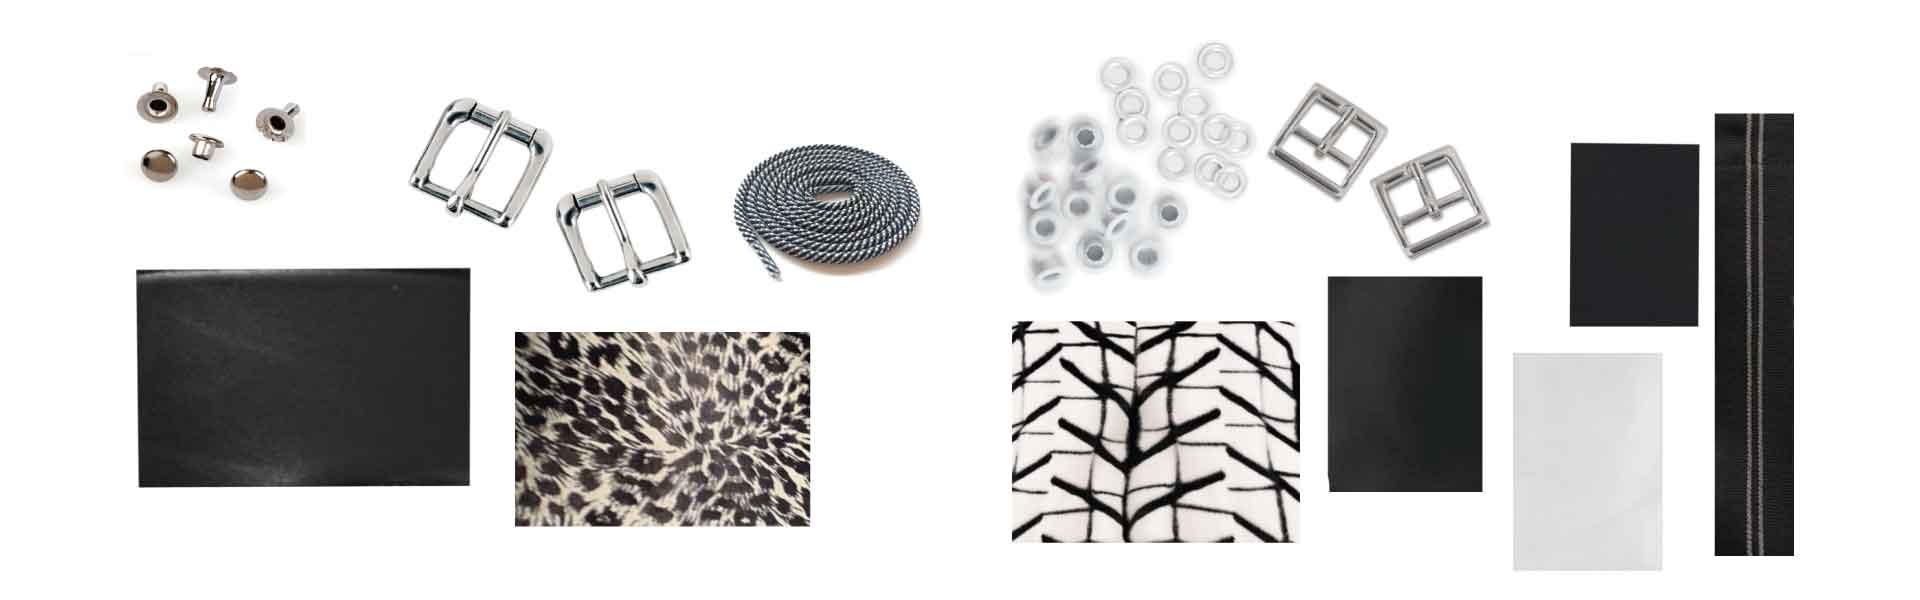 Footwear Trend FW20 - Hairy Textures in Black & White - Footwear Designer - Materials & Trims